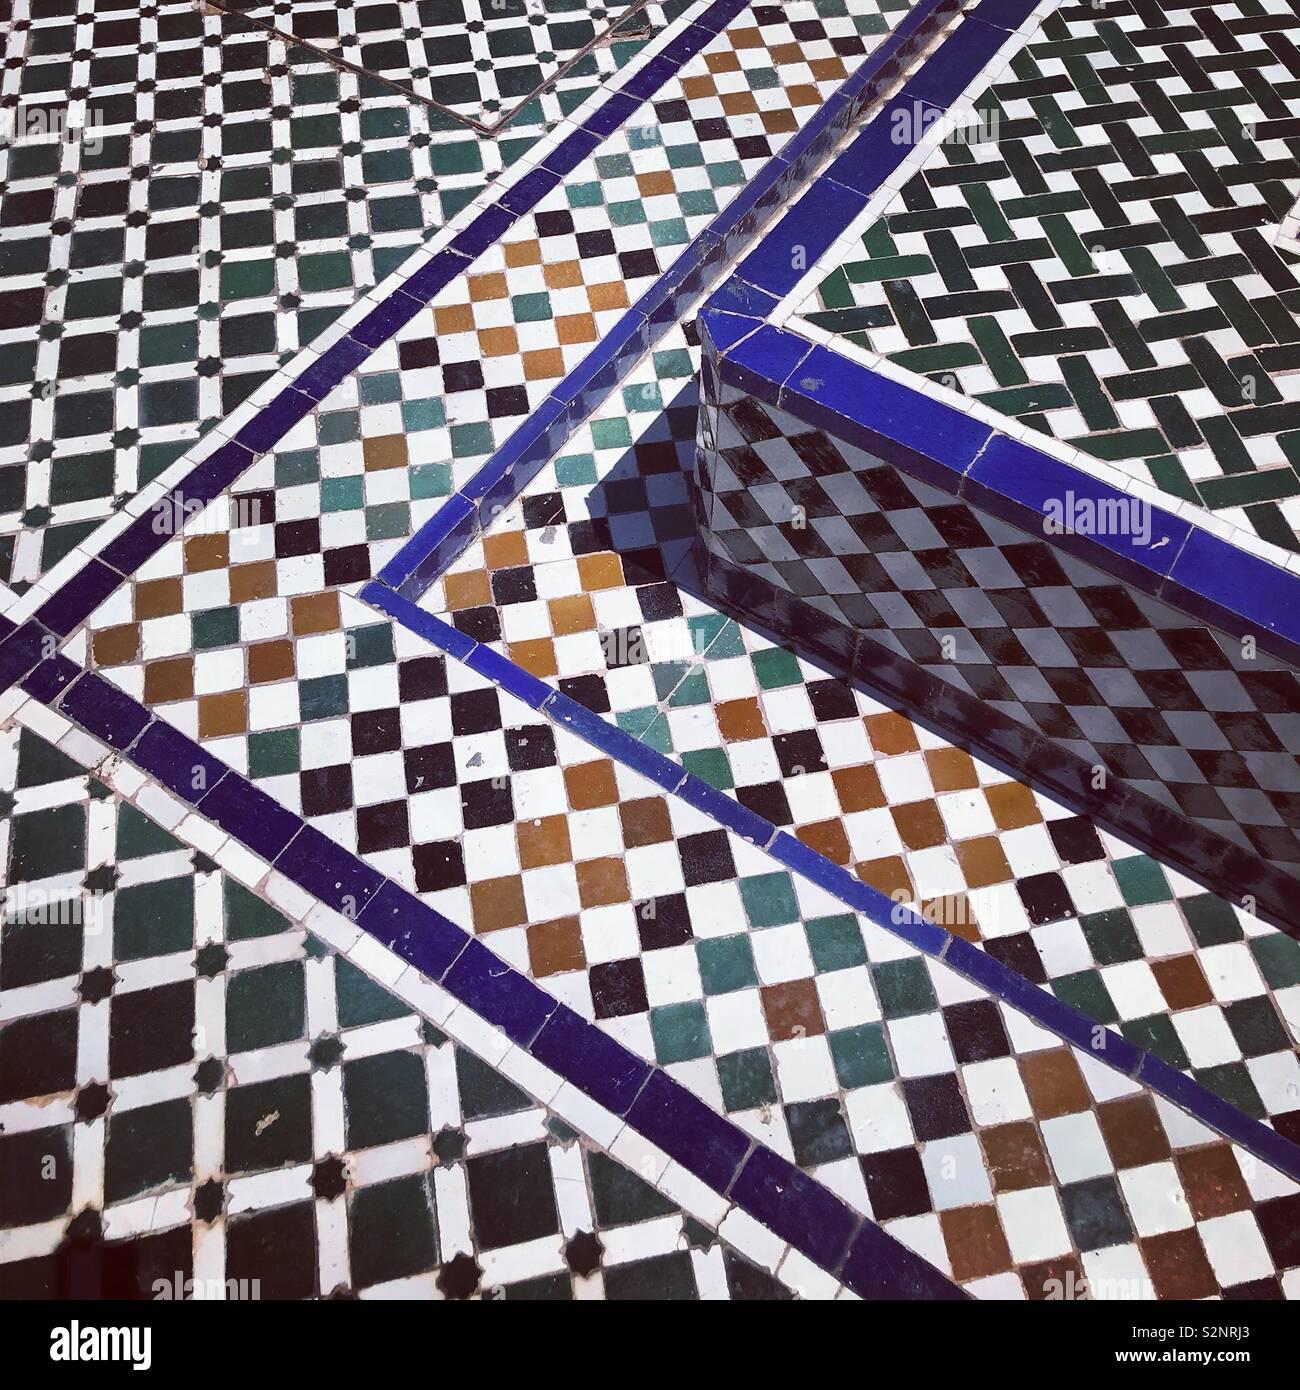 Fliesenboden des Bahia Palace in Marokko Marrakesch Nordafrika Stockfoto